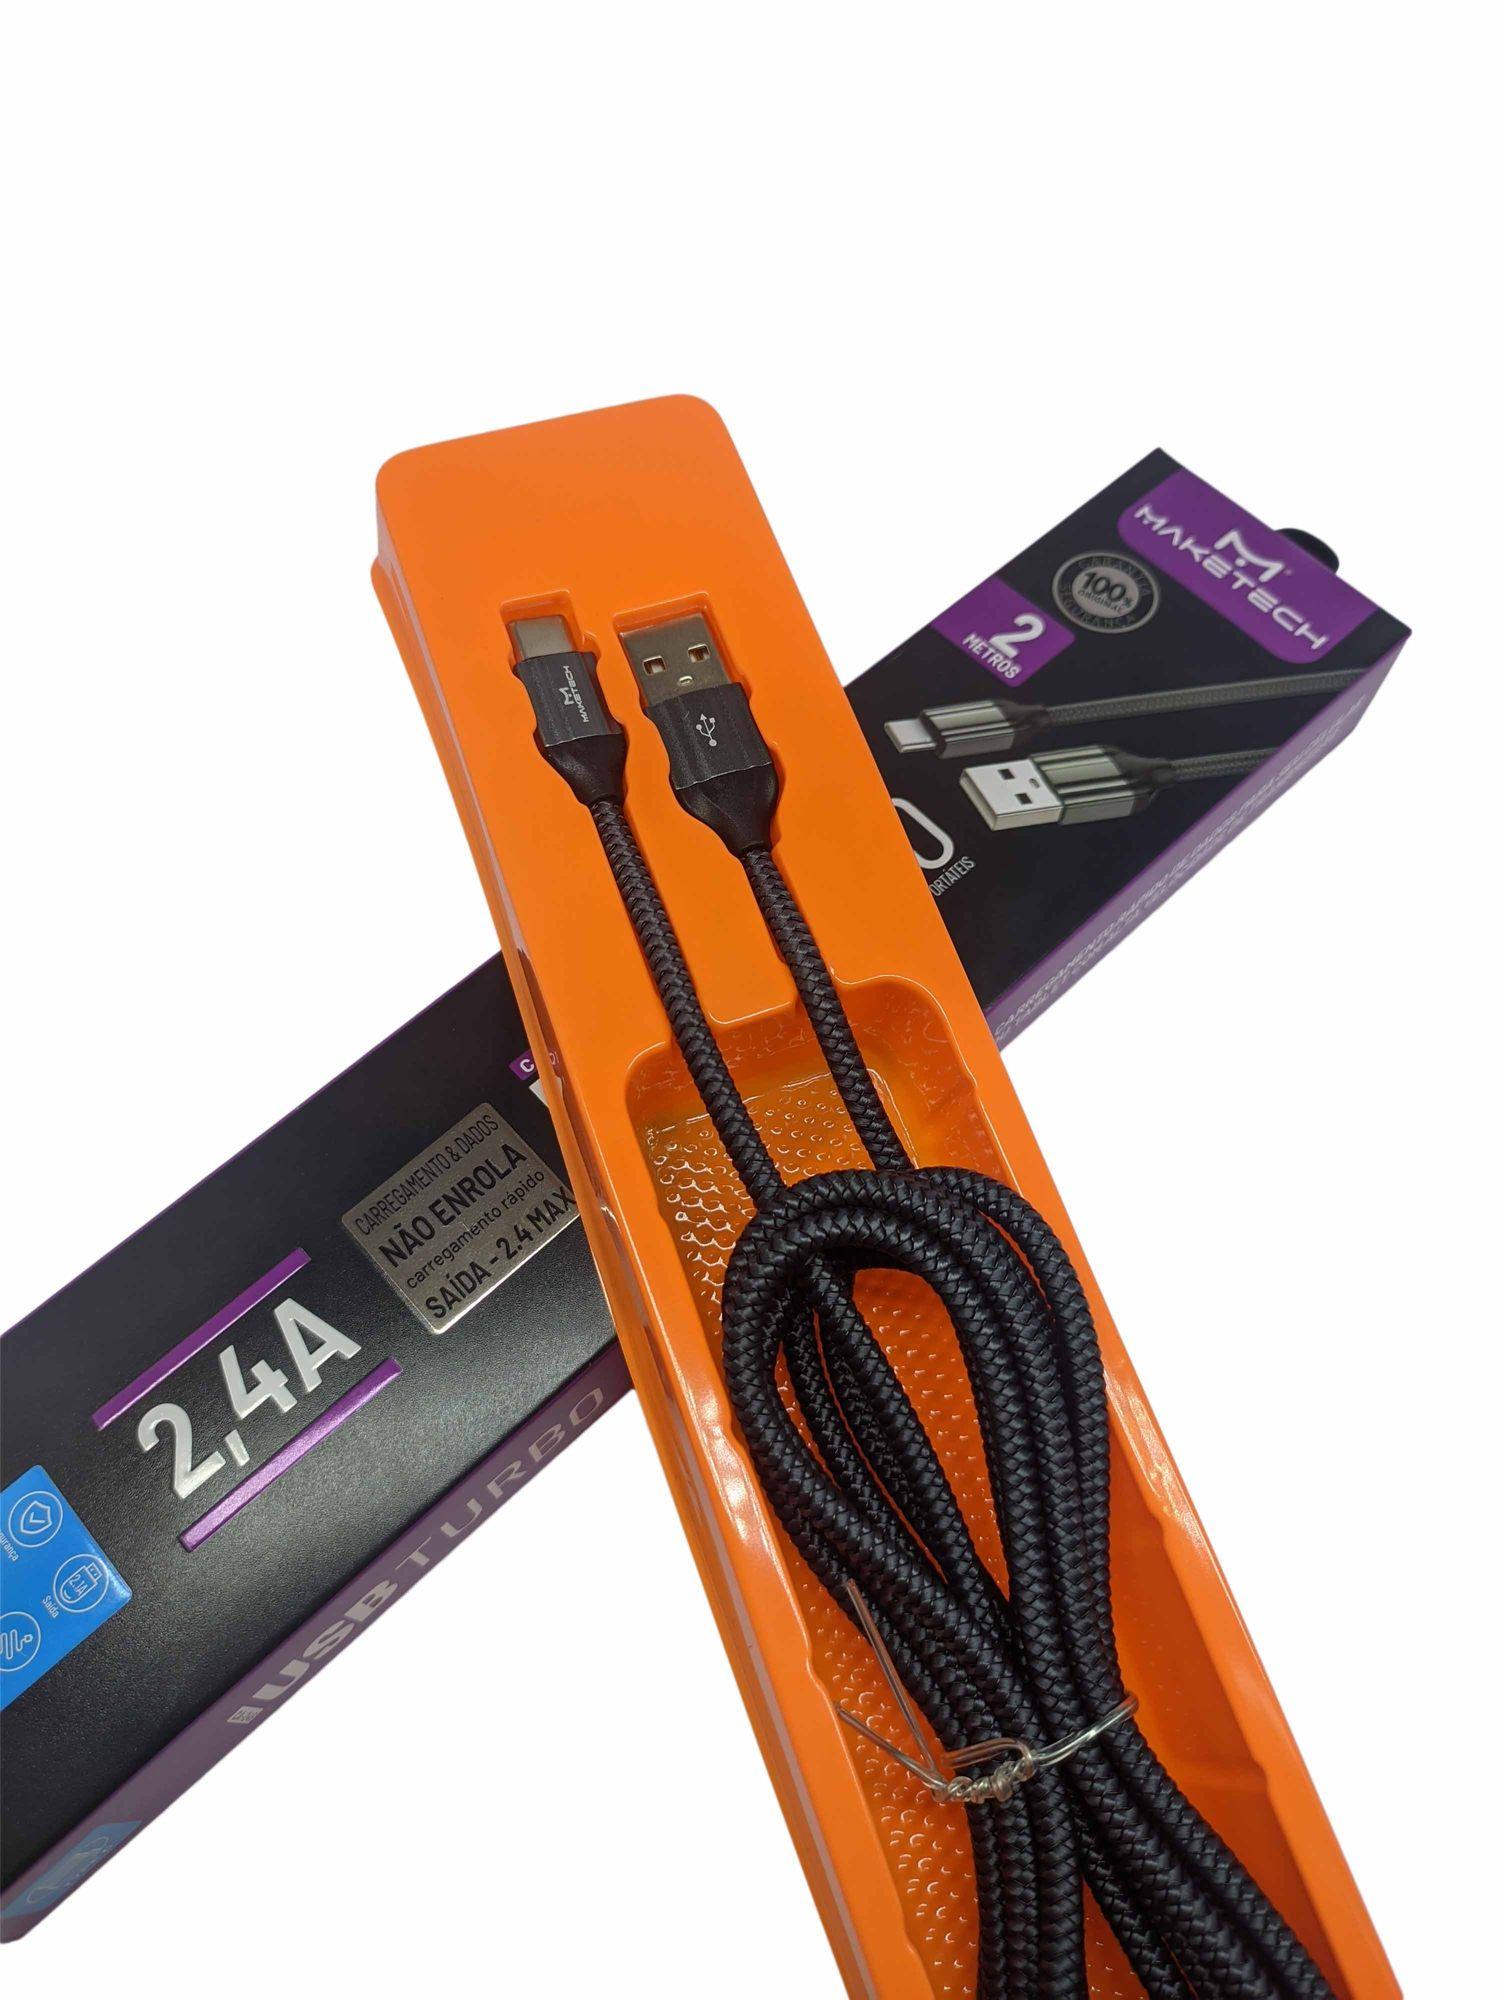 Cabo USB Turbo Micro USB C-245 Revestido com Corda Super Resistente